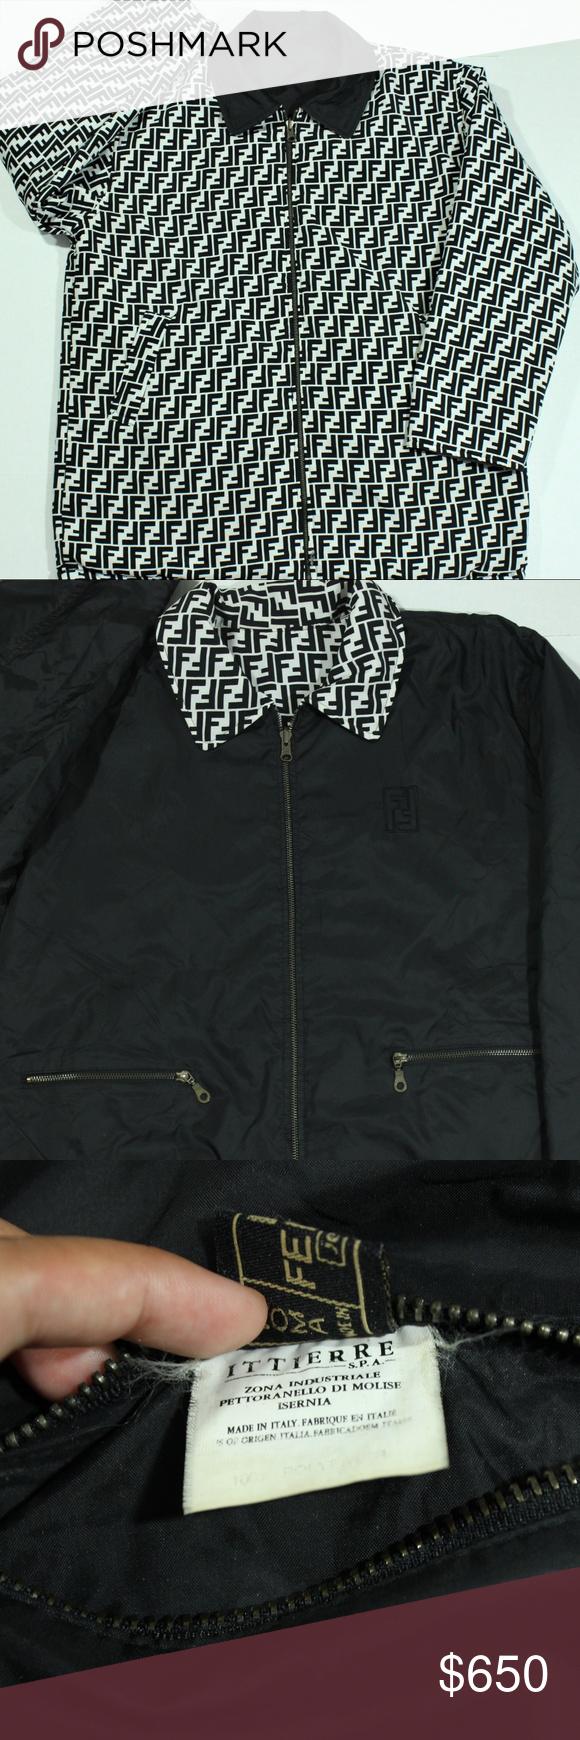 Vtg Authentic Fendi Zucca Silver Monogram Jacket Monogram Jacket Silver Monogram Reversible Jacket Men